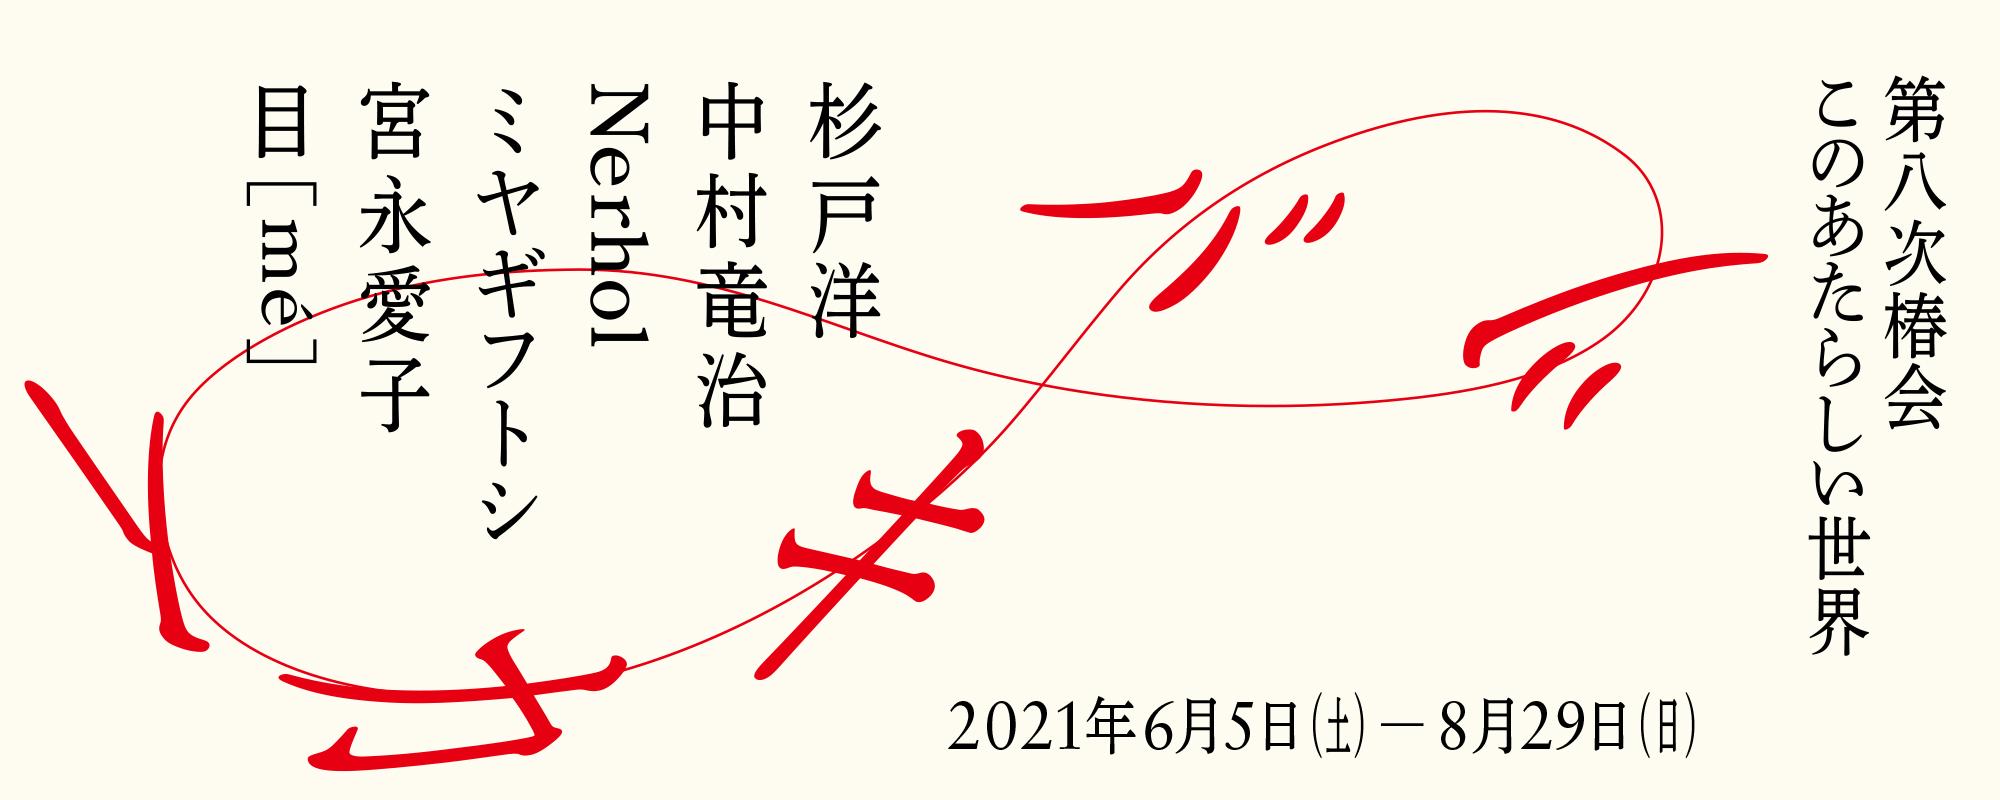 "Tsubaki-kai 8: ""This New World"" Hiroshi Sugito, Ryuji Nakamura, Nerhol, Futoshi Miyagi, Aiko Miyanaga, [mé]"